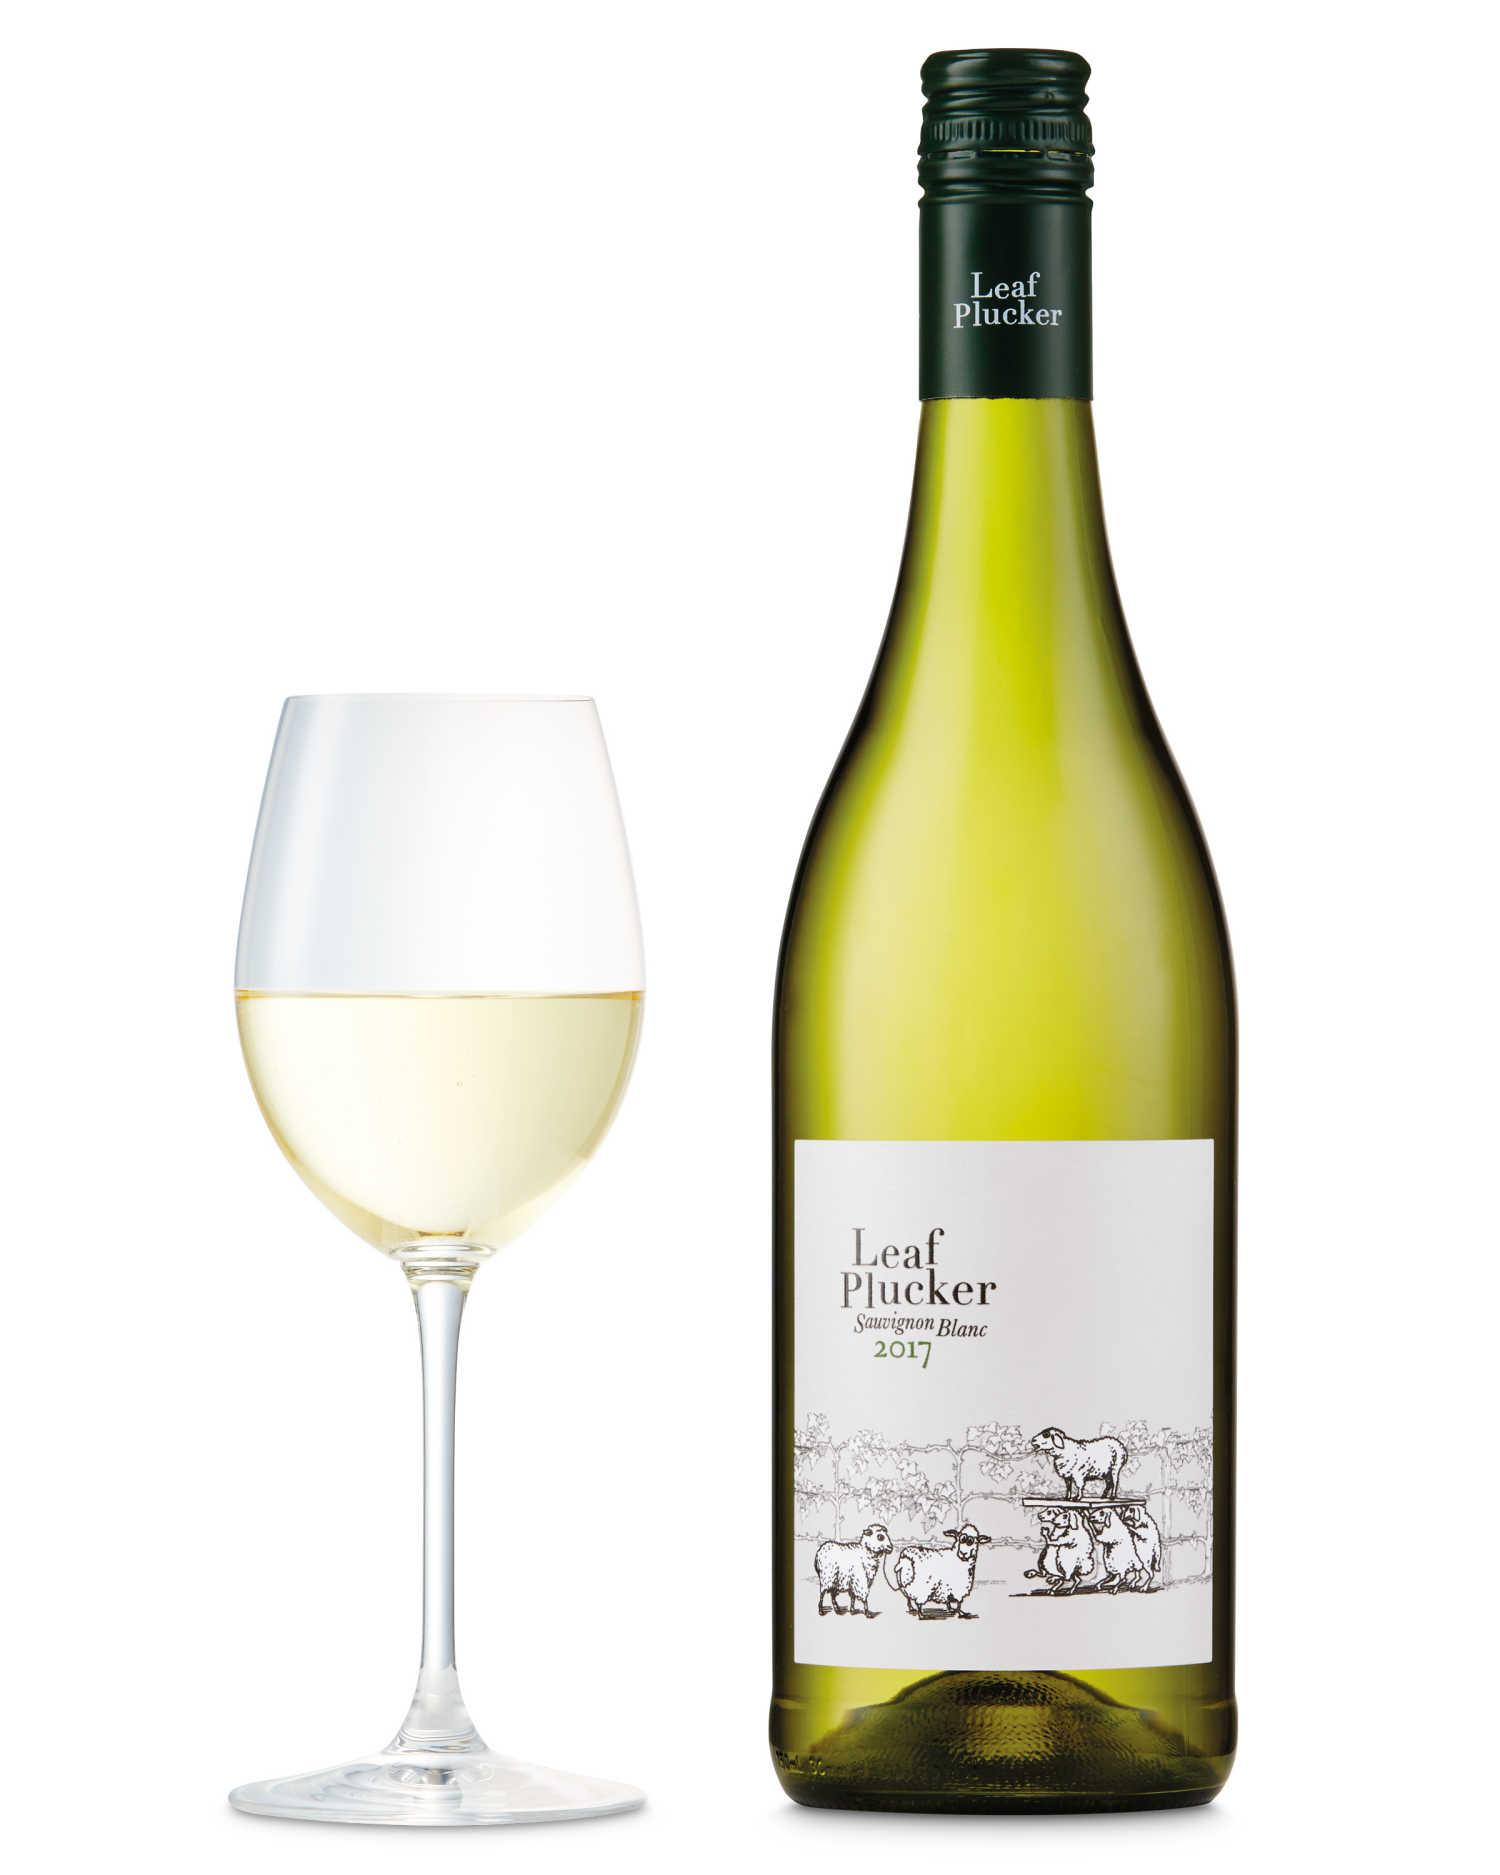 Leaf Plucker Sauvignon Blanc 2017